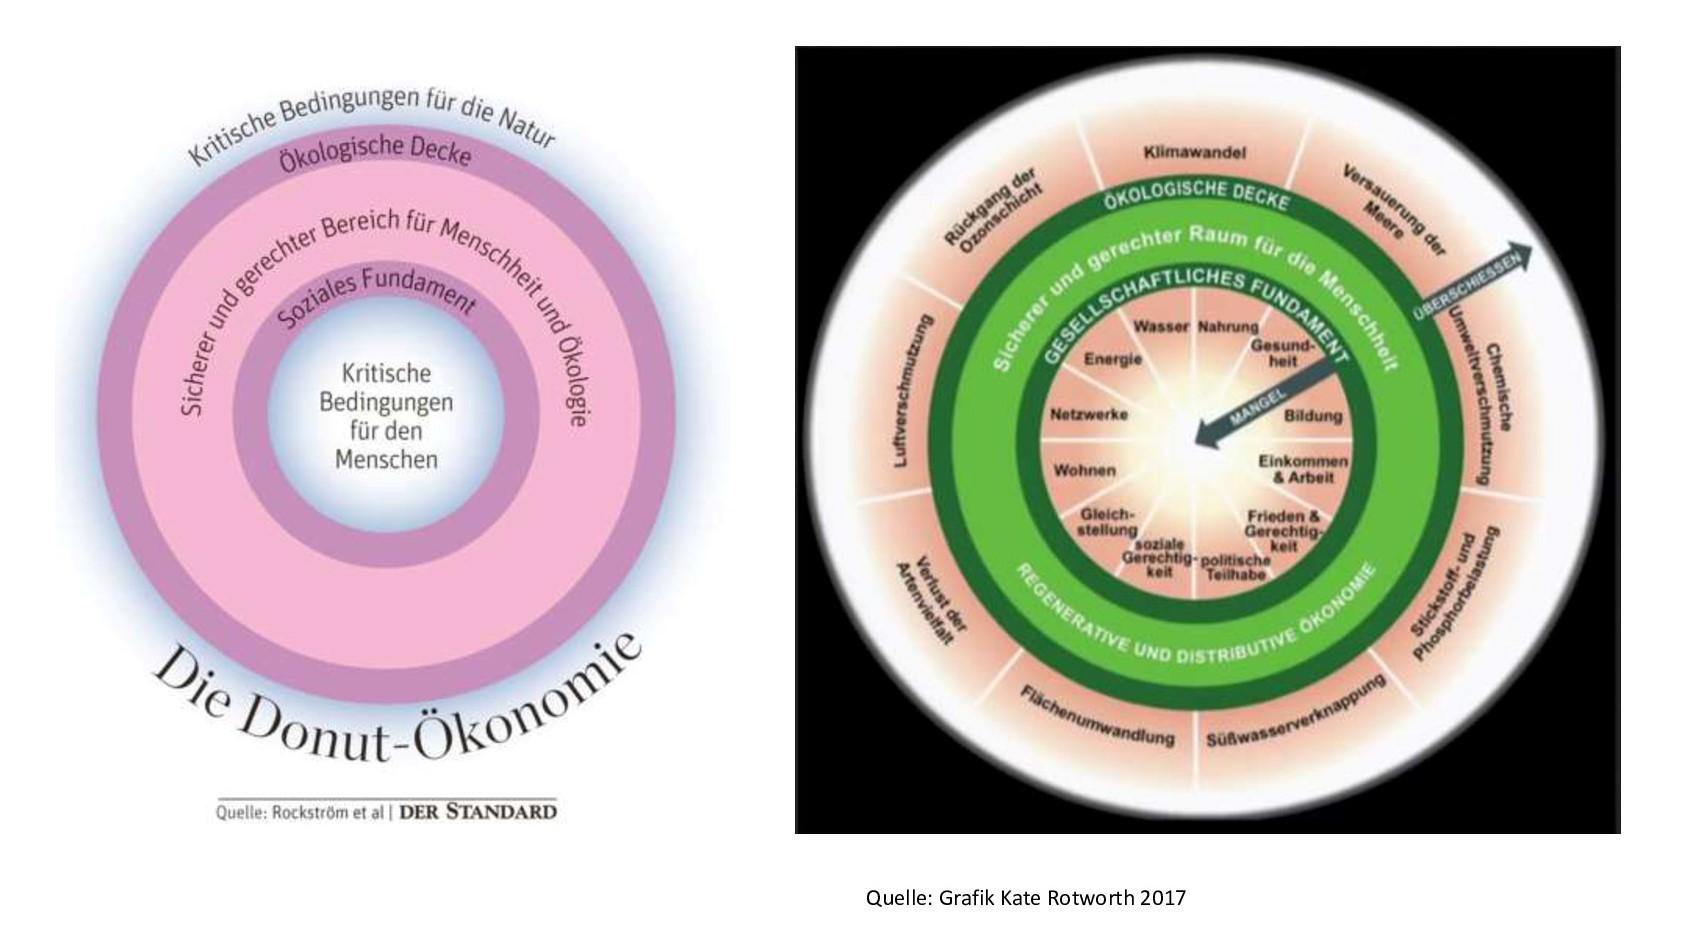 Donut-Oekonomie 2jpg